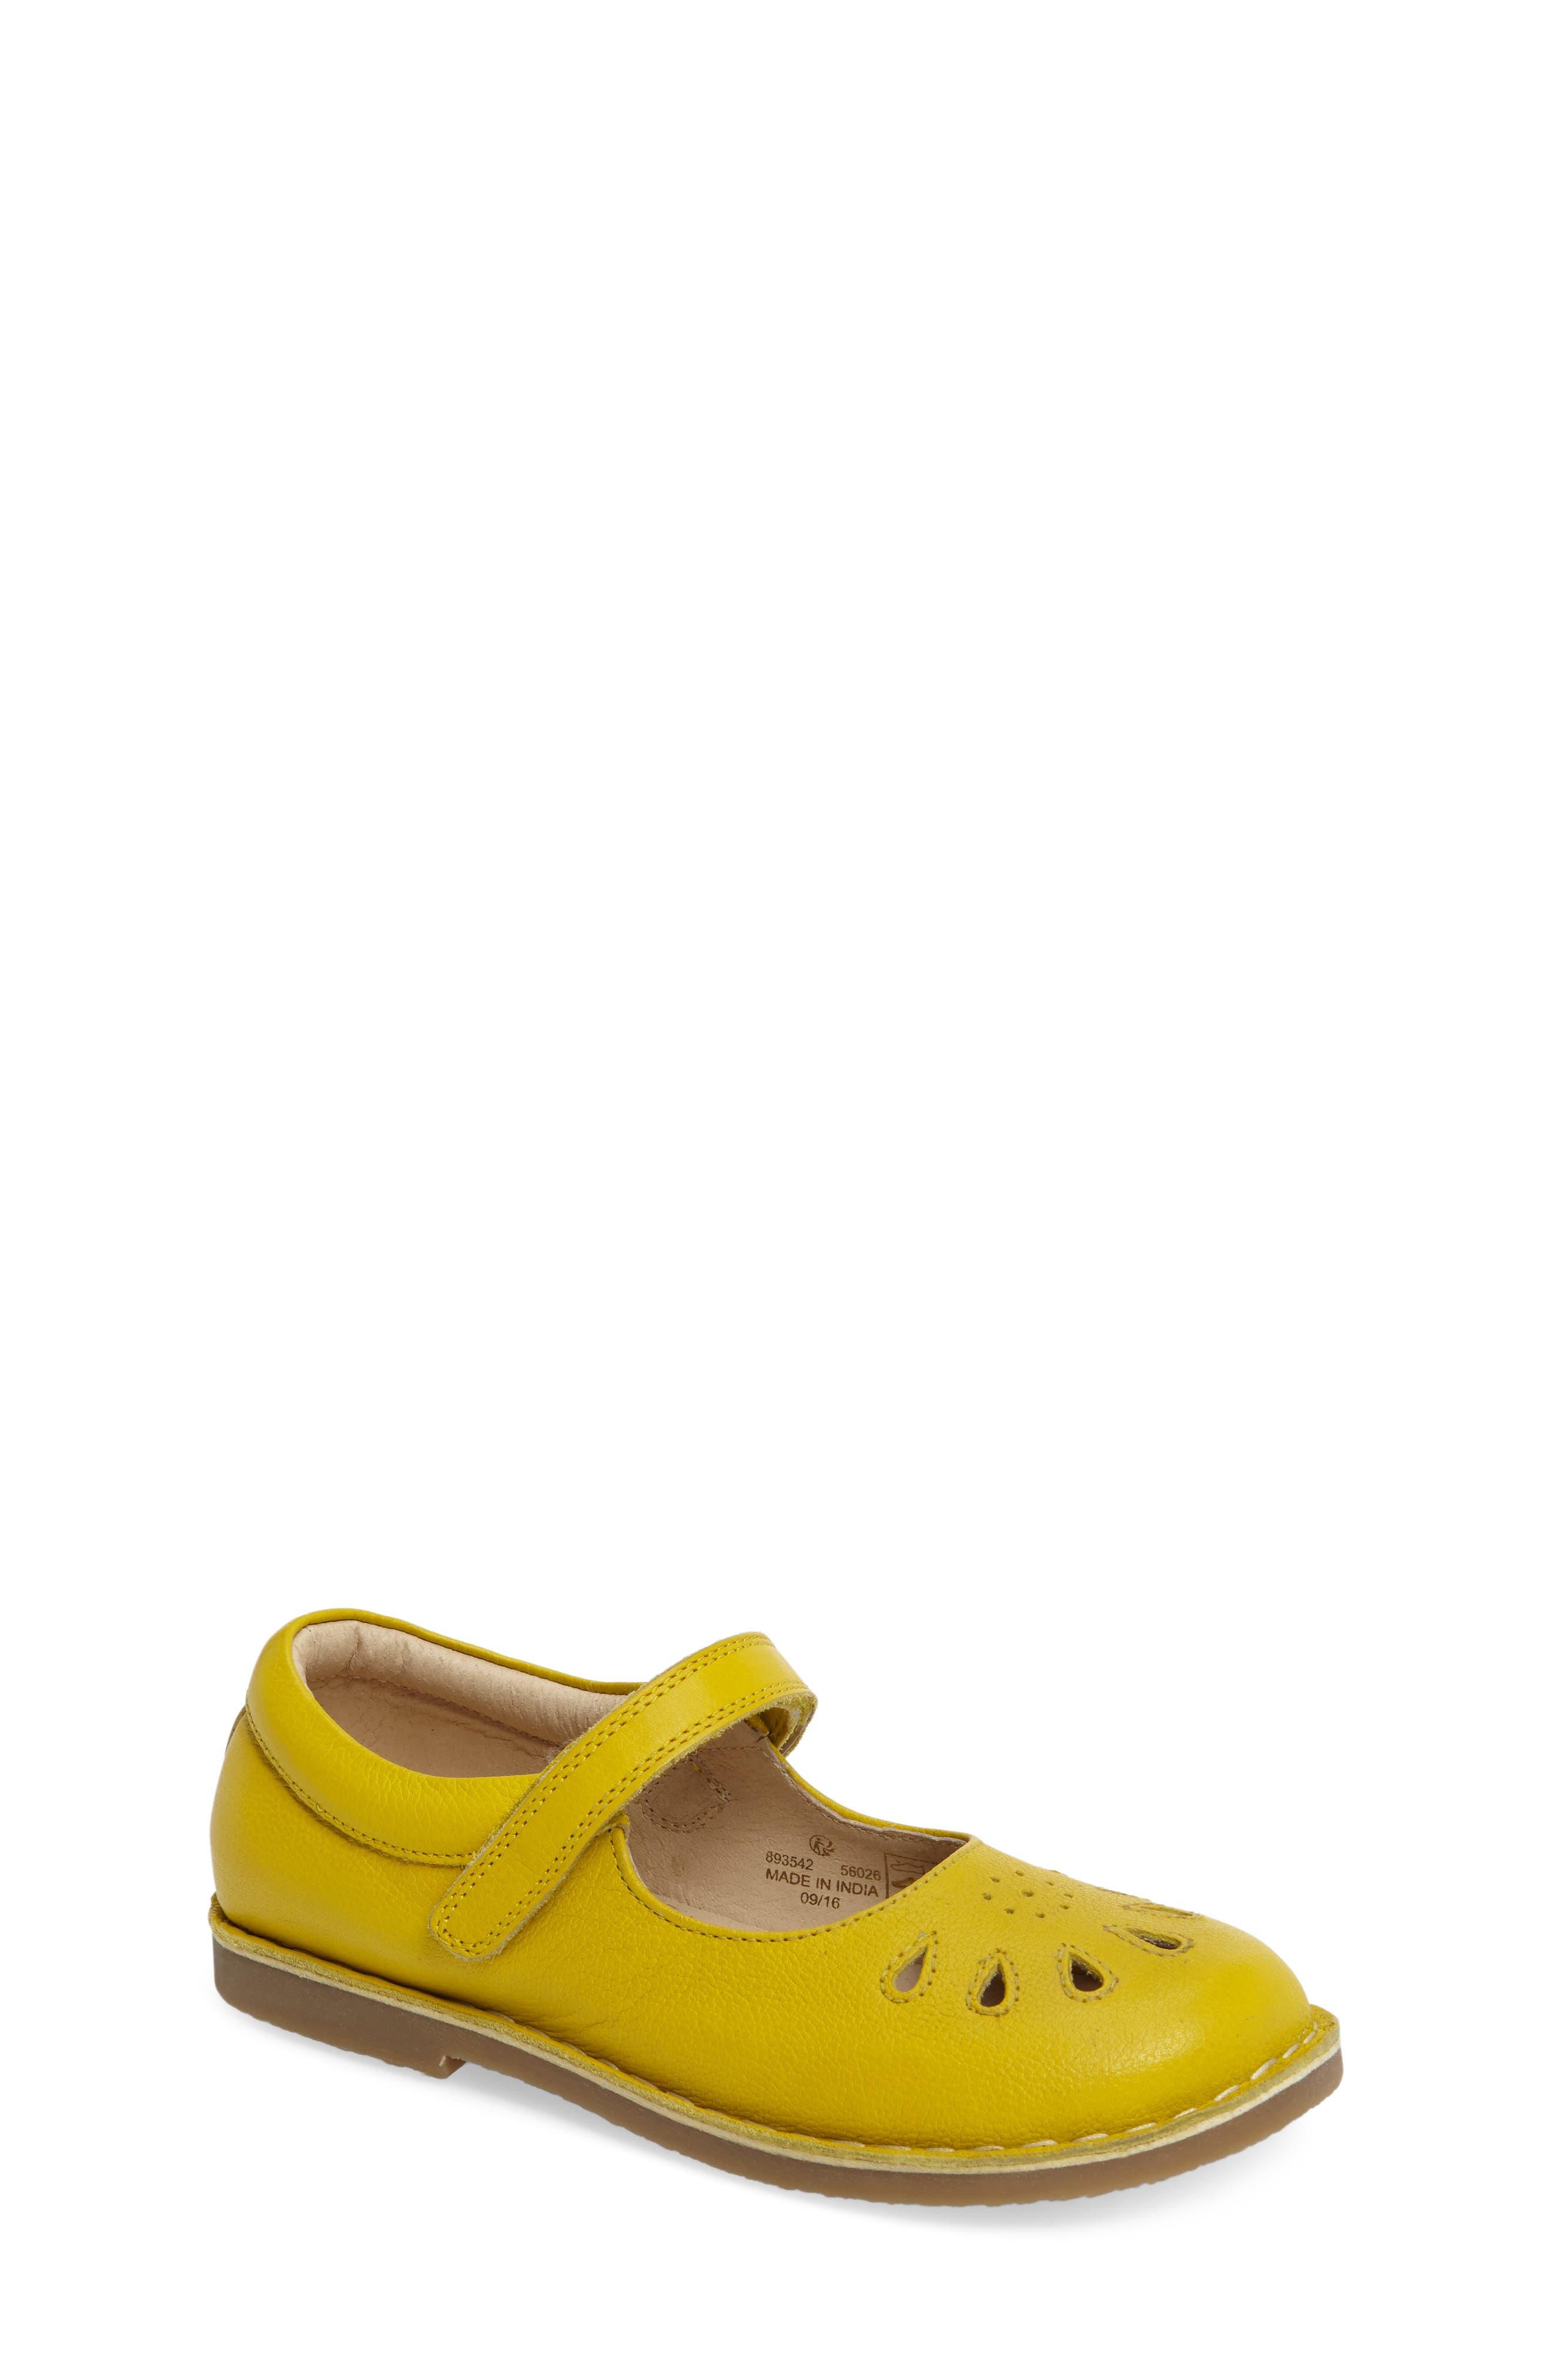 Mini Boden Mary Jane Shoe (Toddler, Little Kid & Big Kid)